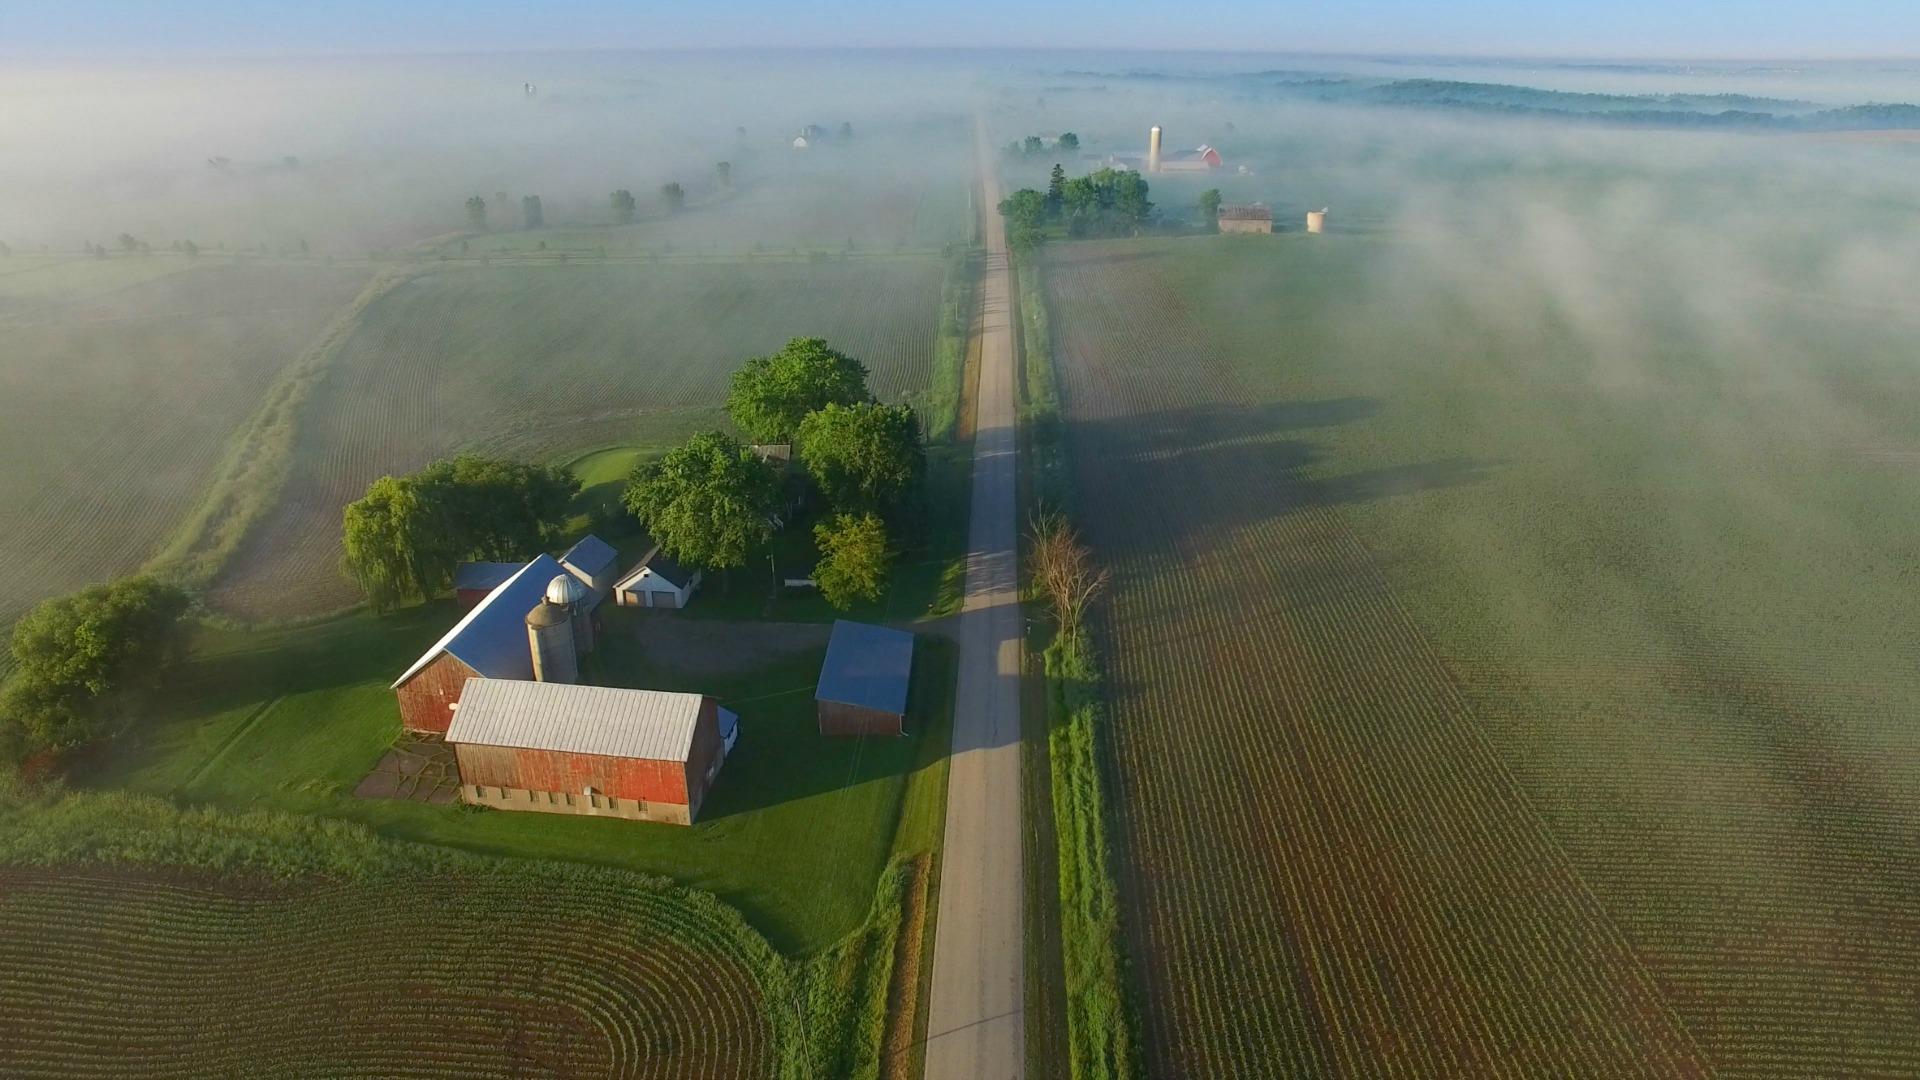 Farm on a rural road